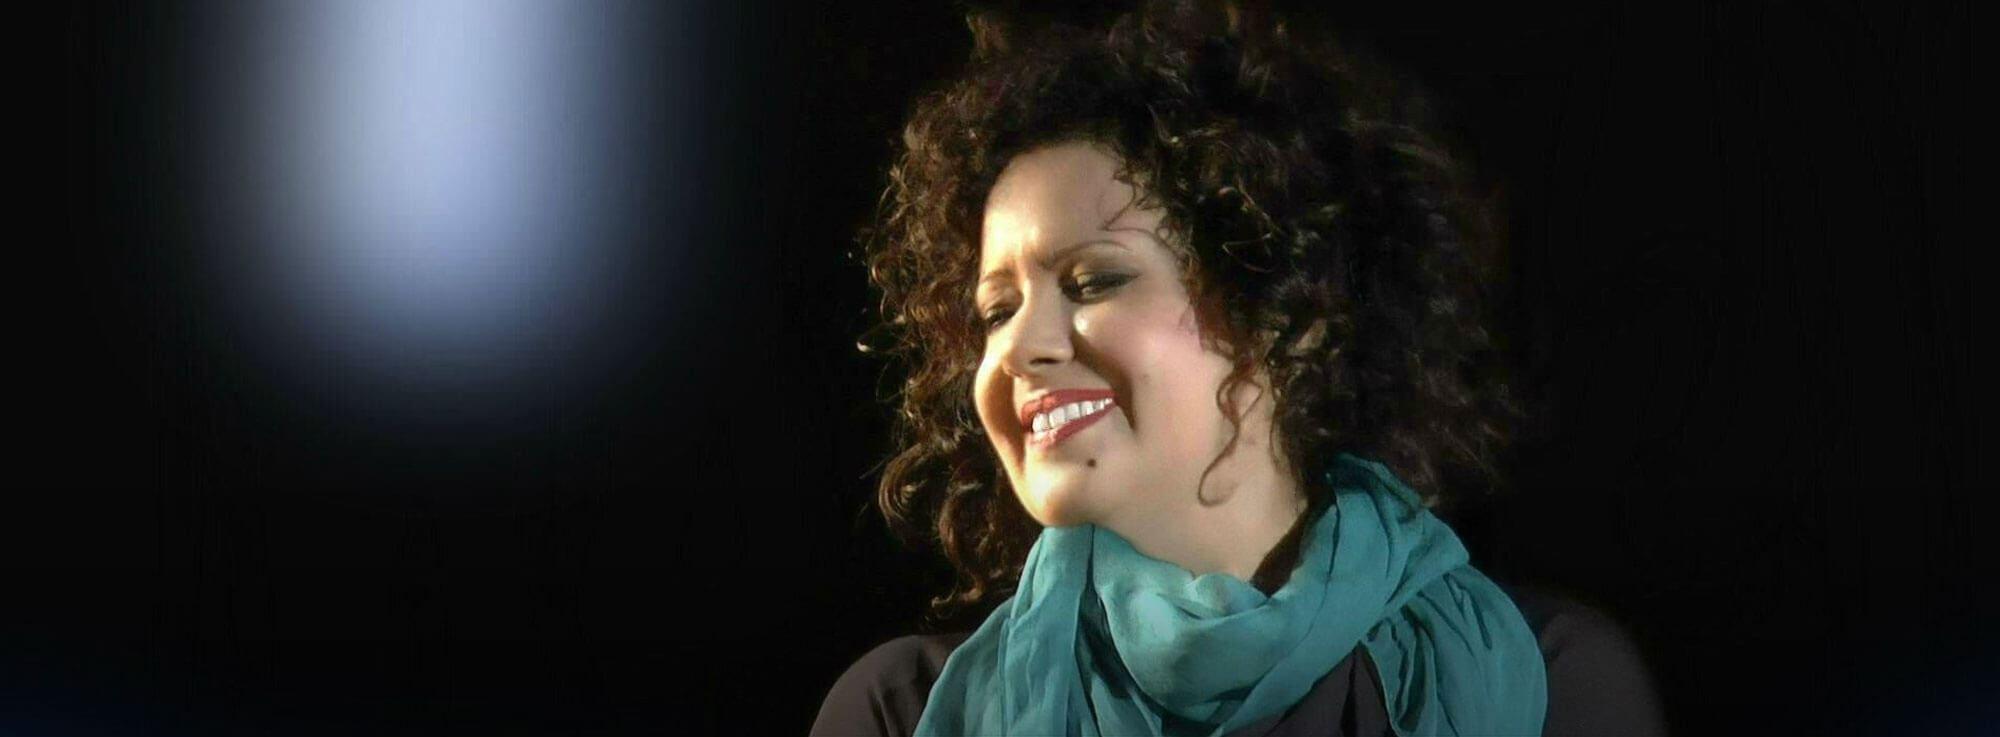 San Severo: Antonella Ruggiero - Stralunato Recital